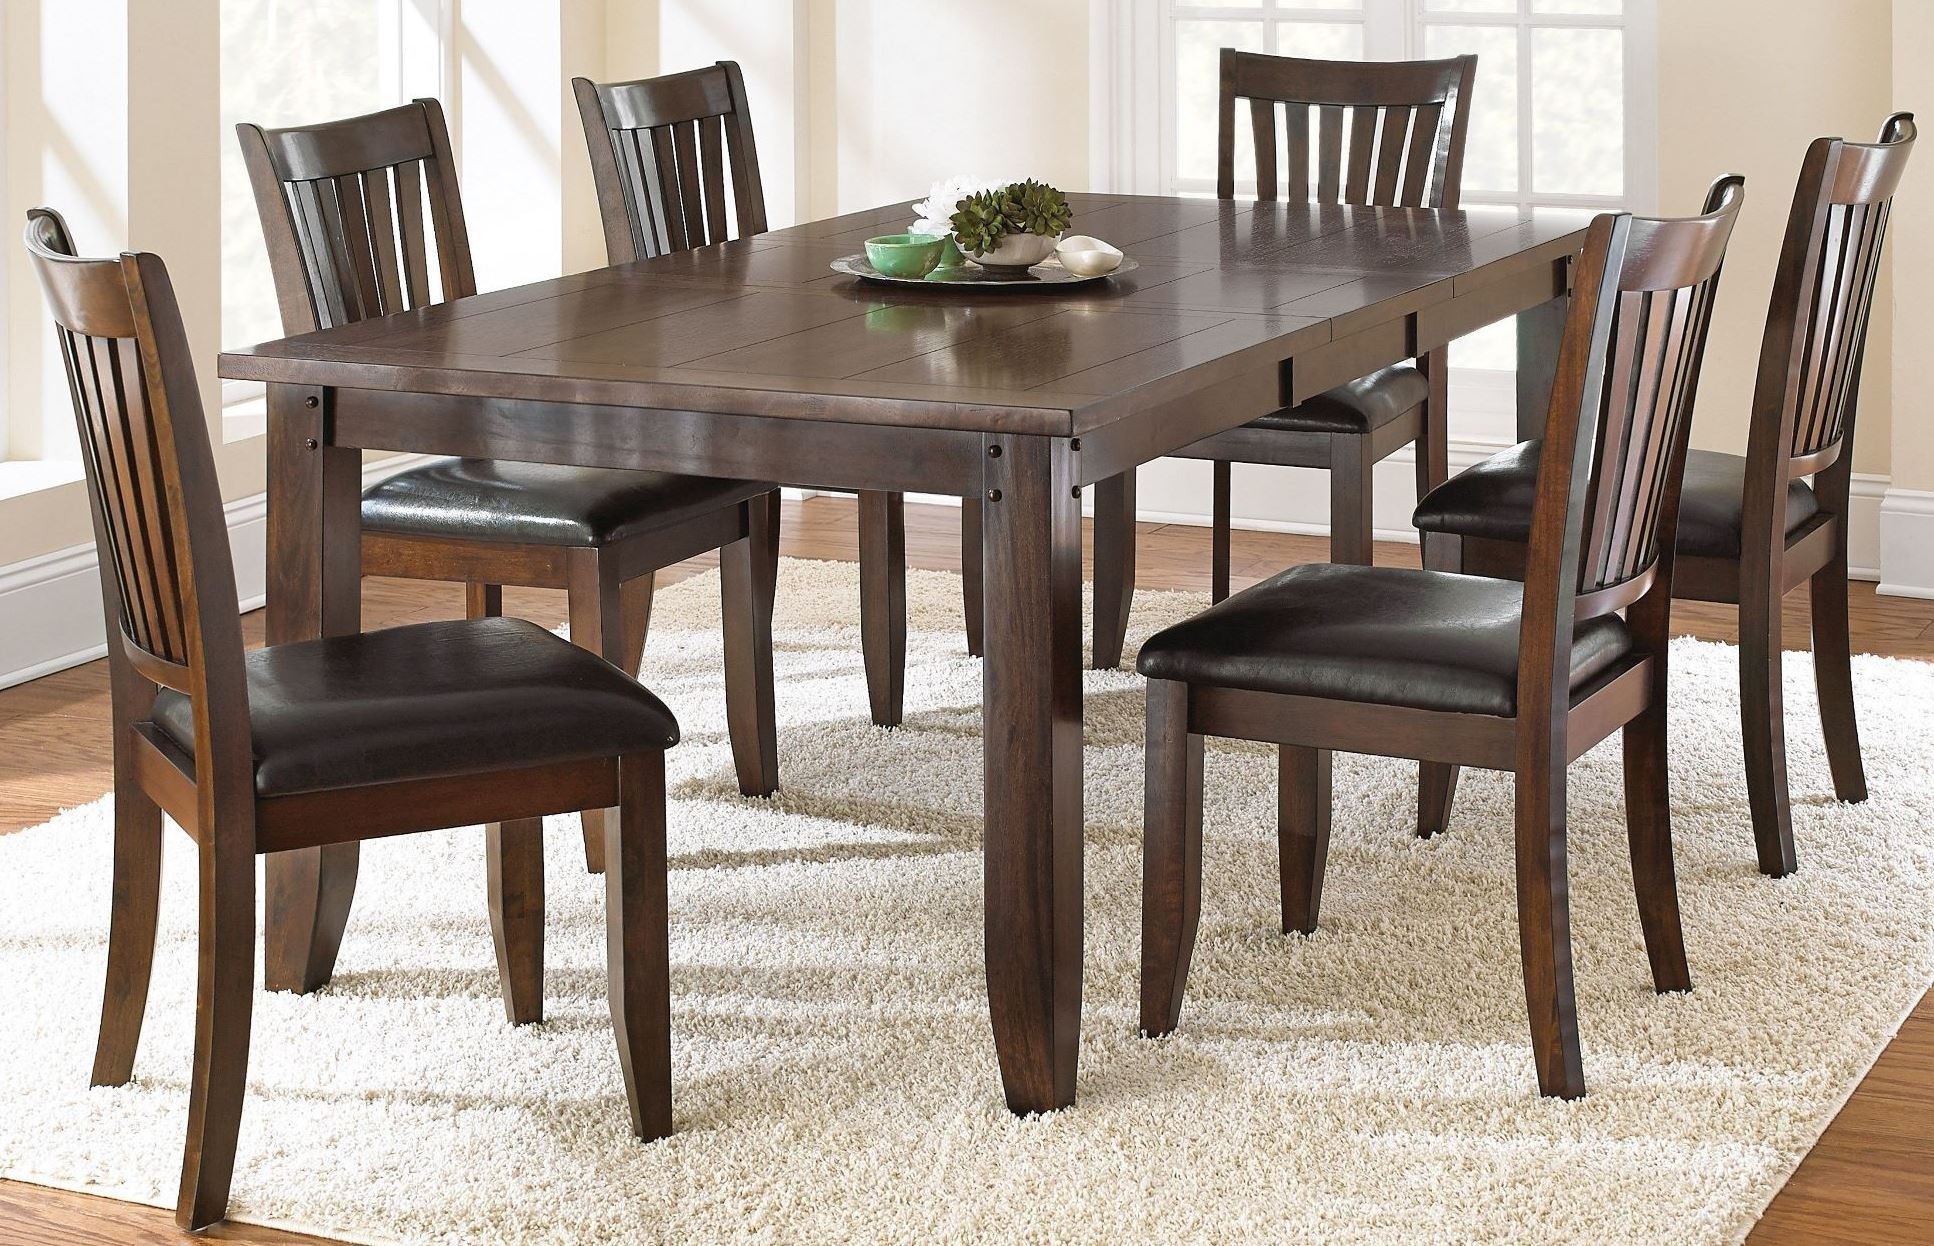 josie red oak extendable rectangular dining room set from steve silver je500t coleman furniture. Black Bedroom Furniture Sets. Home Design Ideas